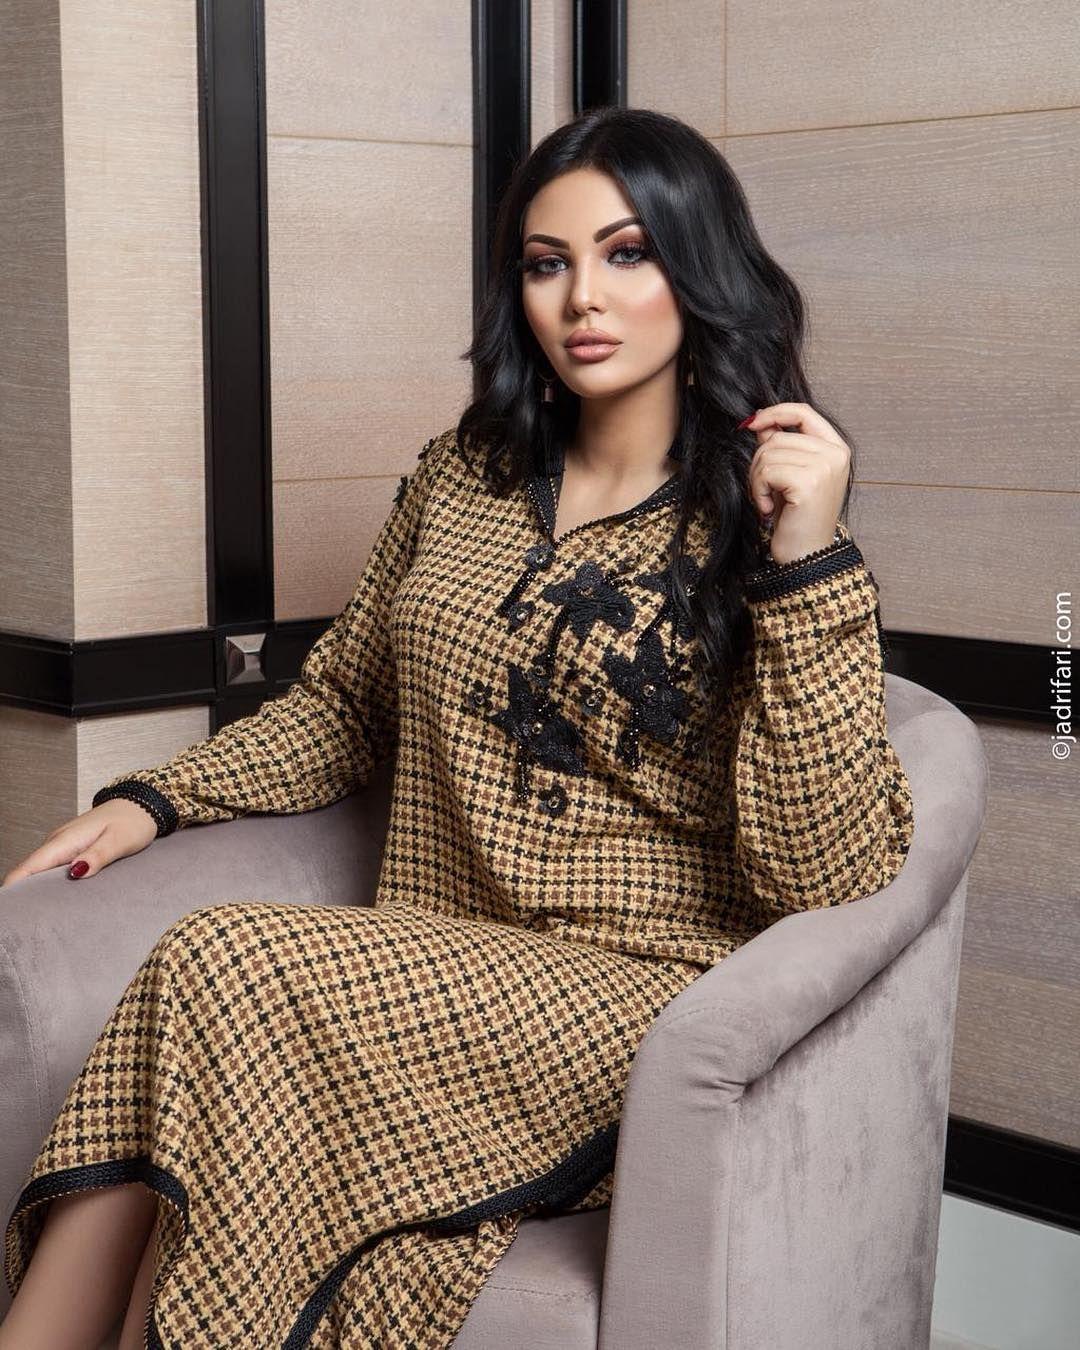 Photo shoot for Liliane magazine Makeup & hair my dear ...